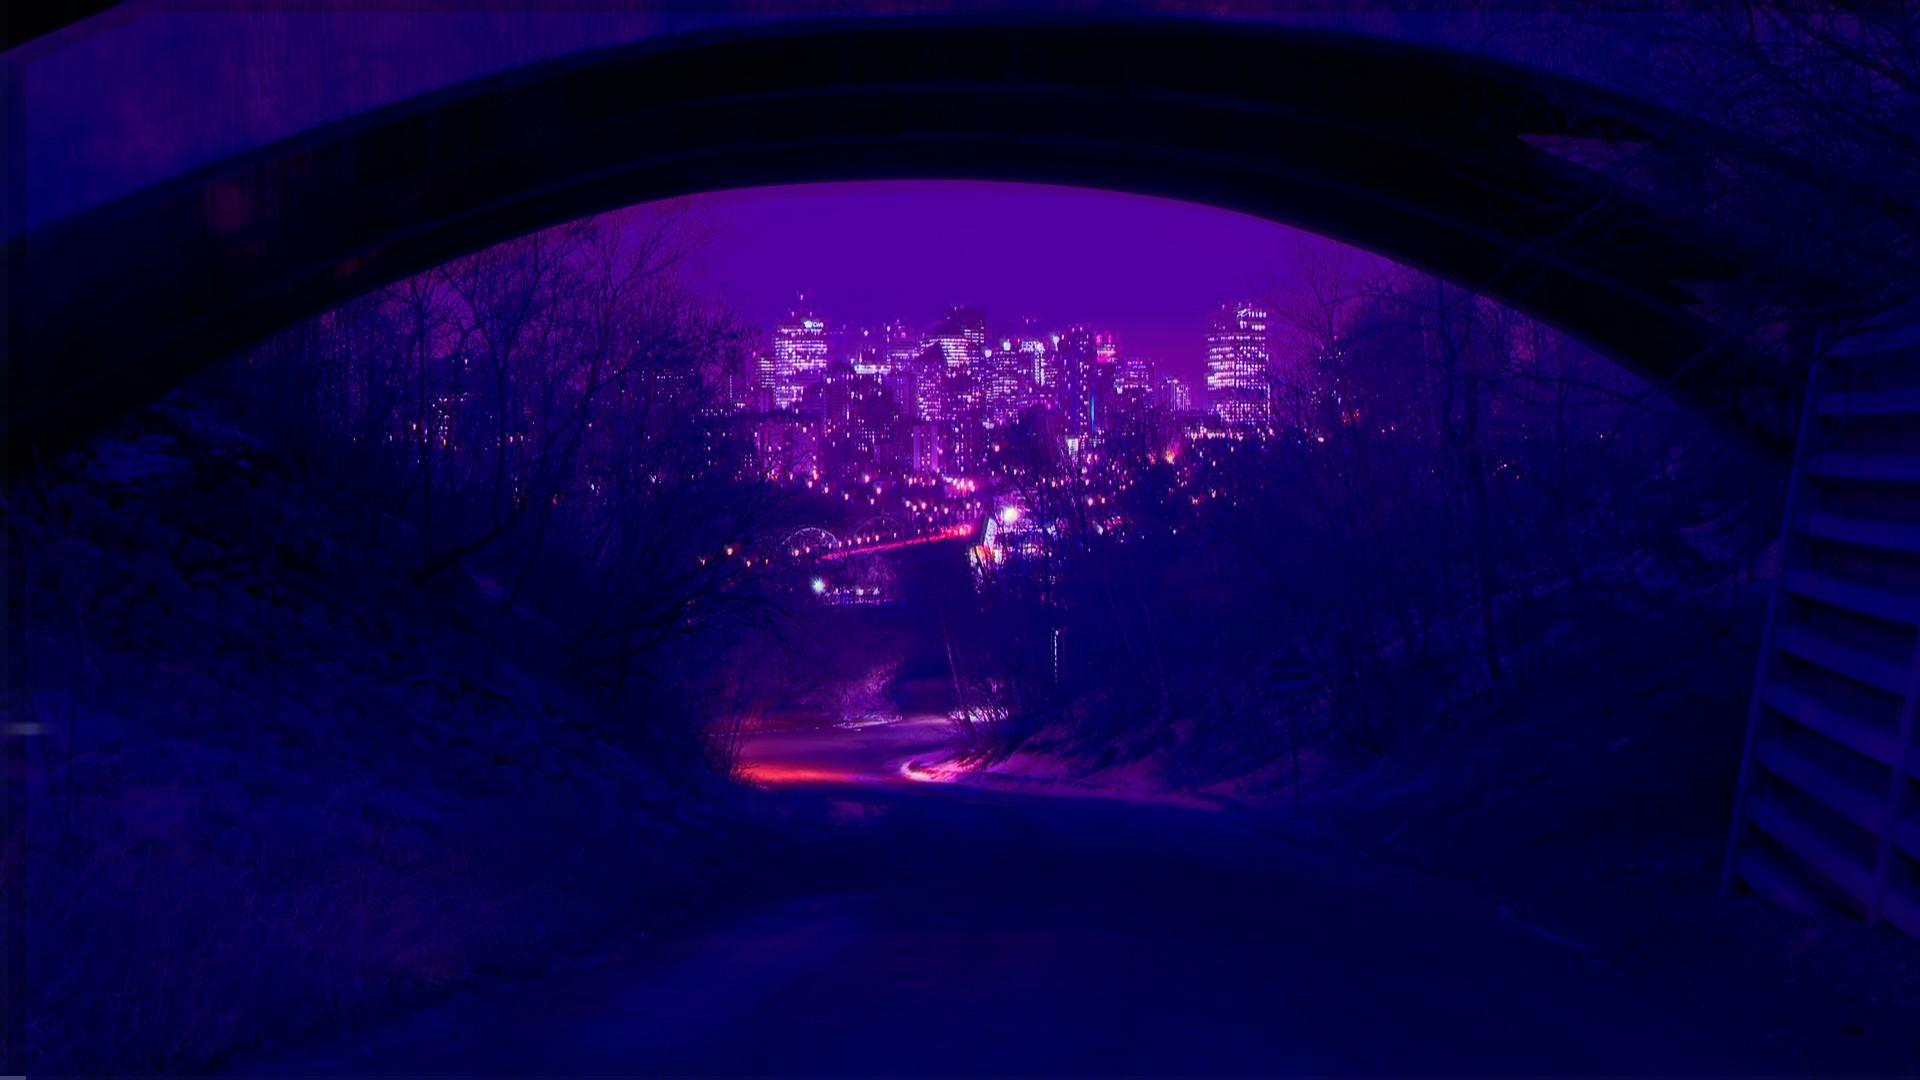 Download Wallpaper Night Aesthetic - 1920x1080-px-aesthetic-neon-1293453  HD.jpg